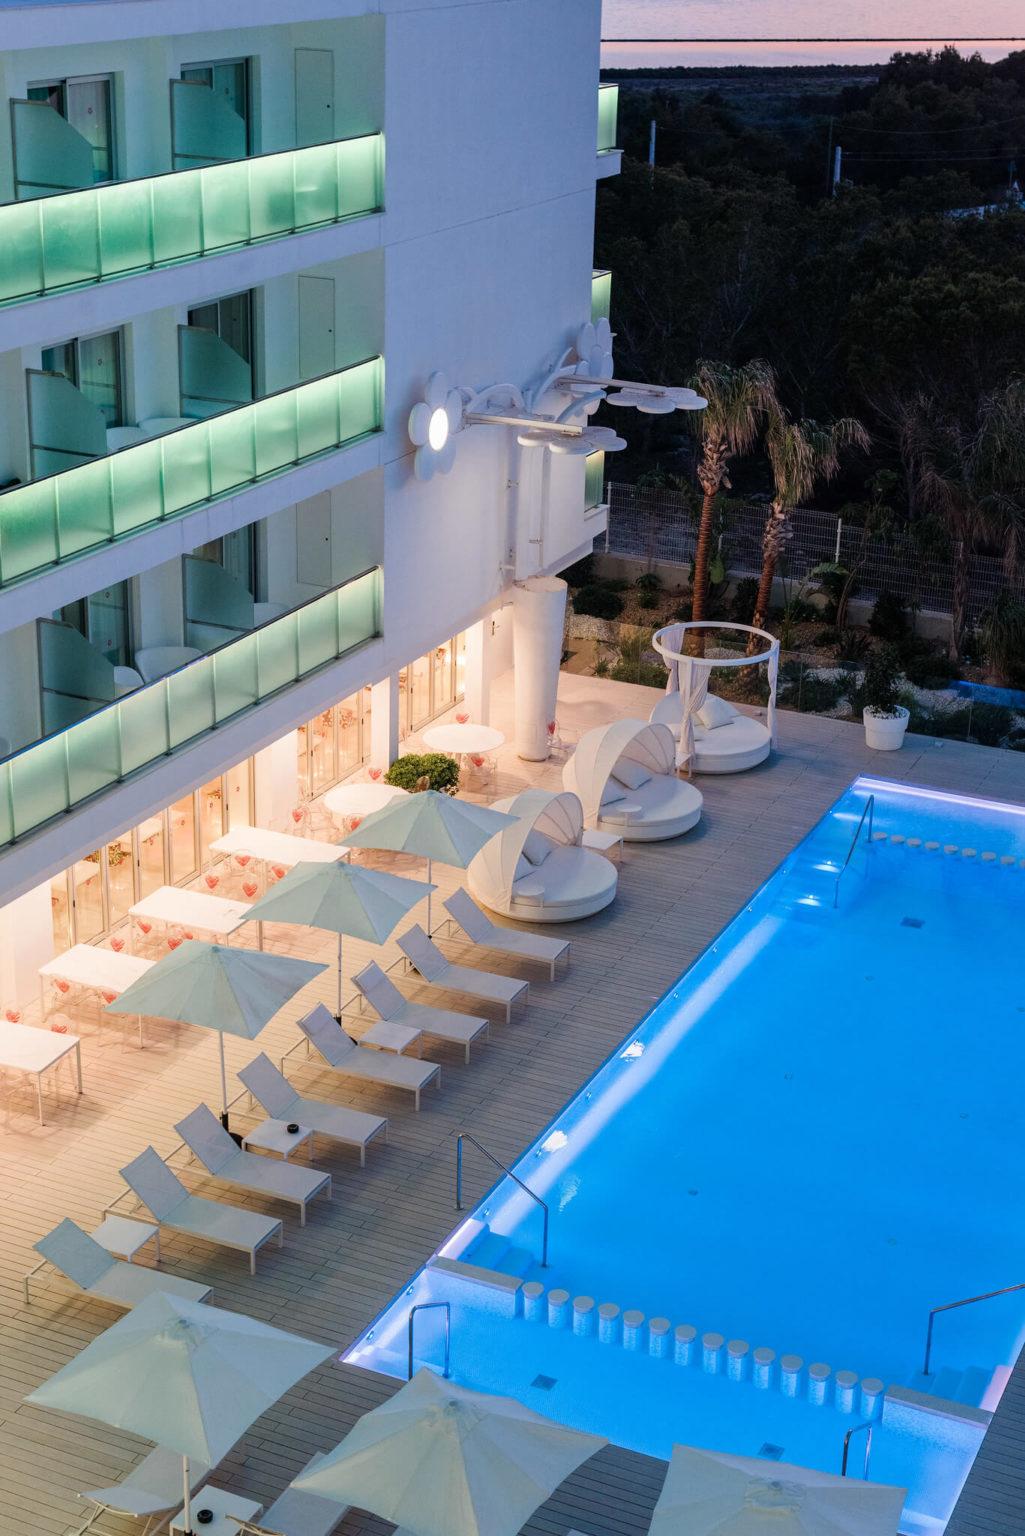 https://www.white-ibiza.com/wp-content/uploads/2020/03/formentera-hotels-five-flowers-2020-06-1025x1536.jpg